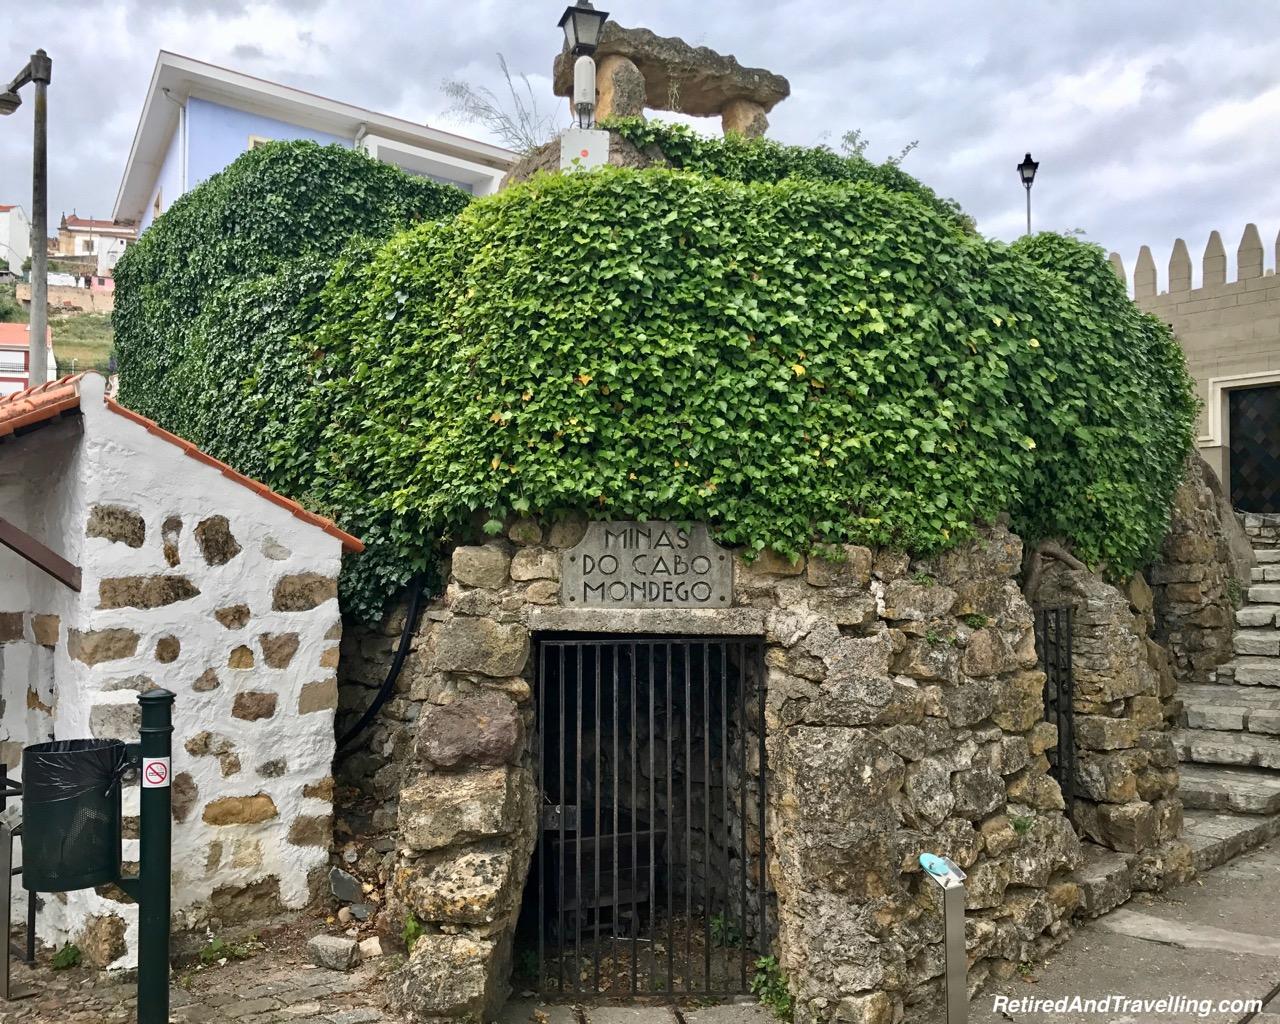 Village Replicas - Portugal Dos Pequenitos - Miniature View of Portugal in Coimbra.jpg